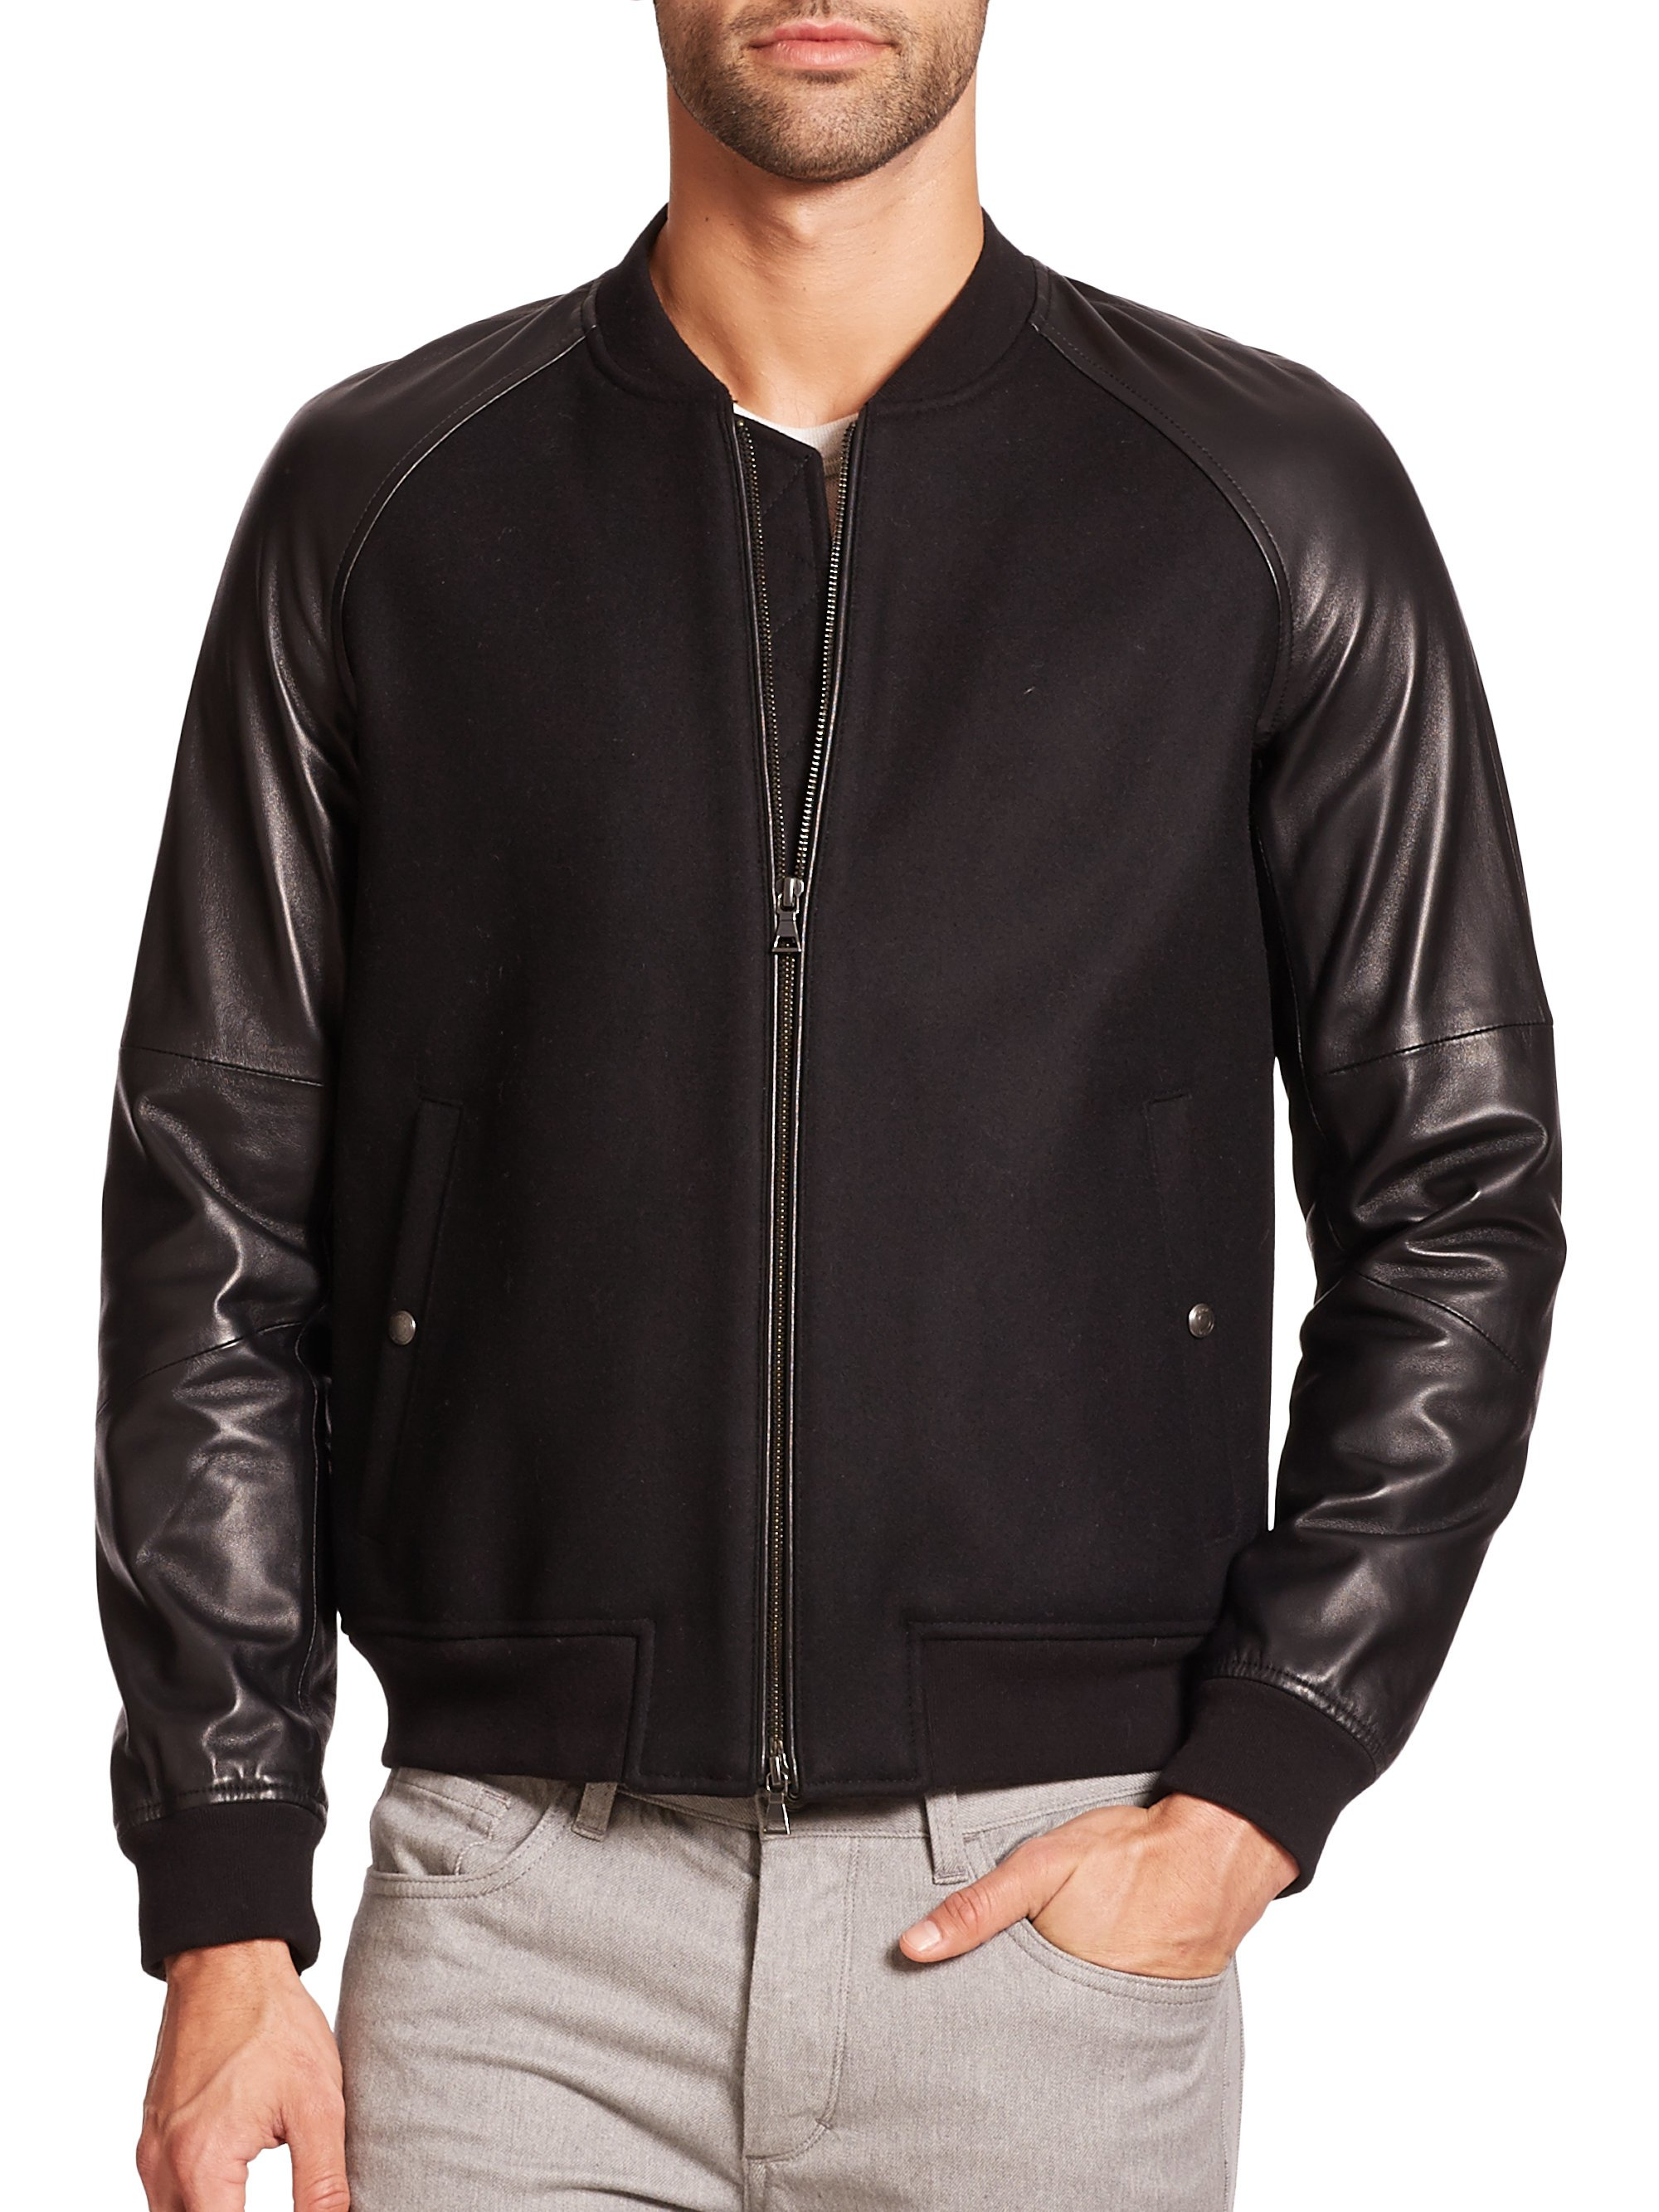 Vince Wool Amp Leather Bomber Jacket In Black For Men Lyst